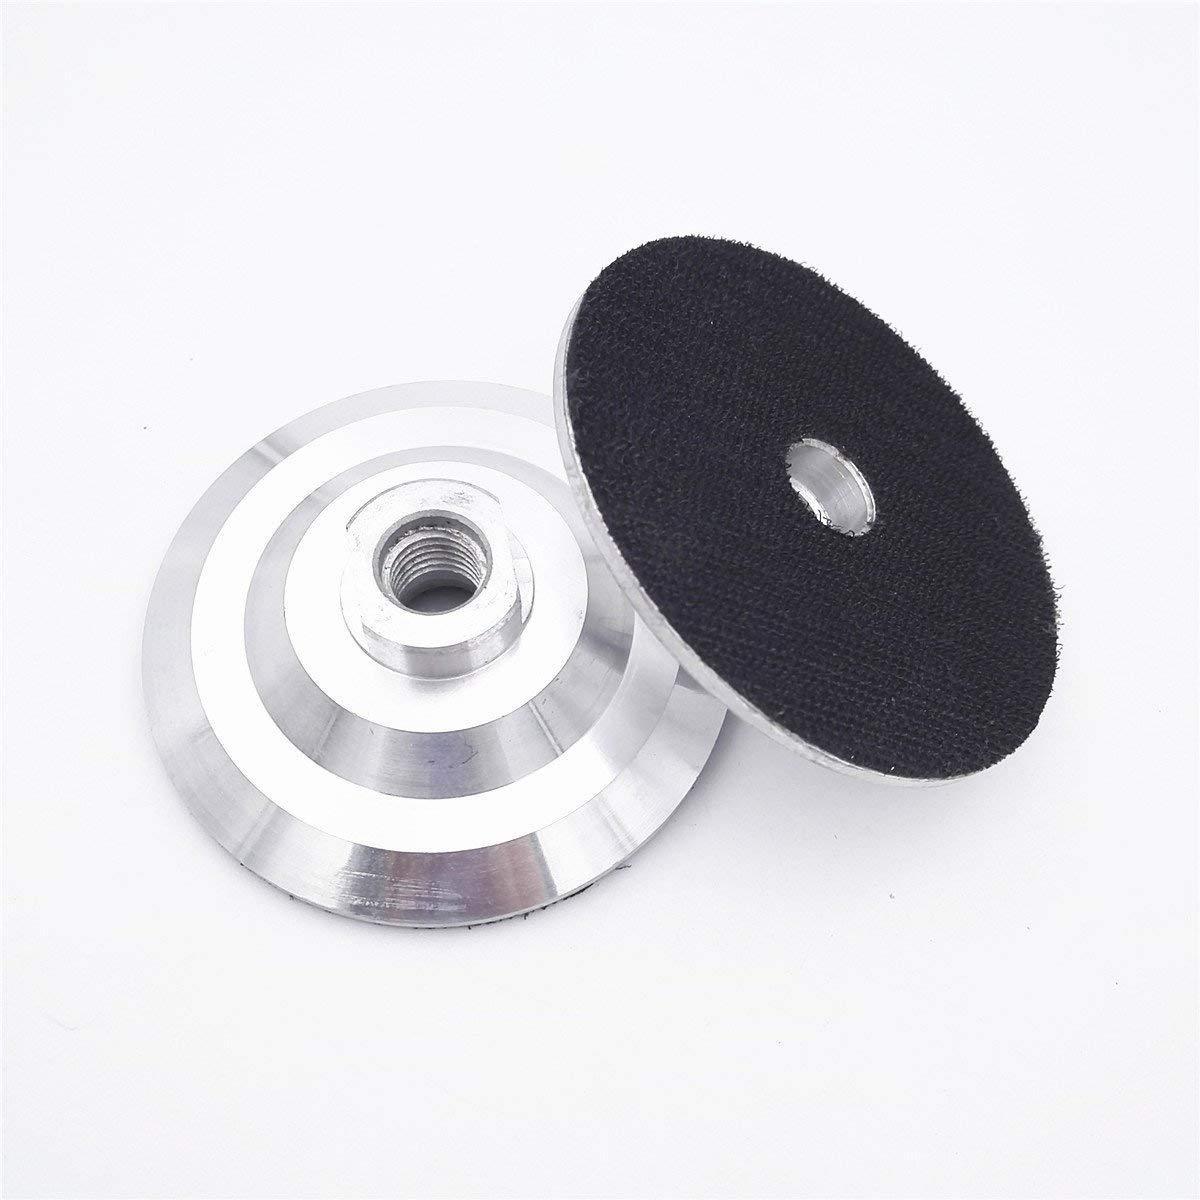 6 Pieces 4 INCH Aluminum based backer Back pad for diamond polishing pads 5/8-11 Thread Velcro backing pad with flexible Nylon Buckle backup pad Hook&Loop Backing Pad Hard Backing Pad grinder polisher